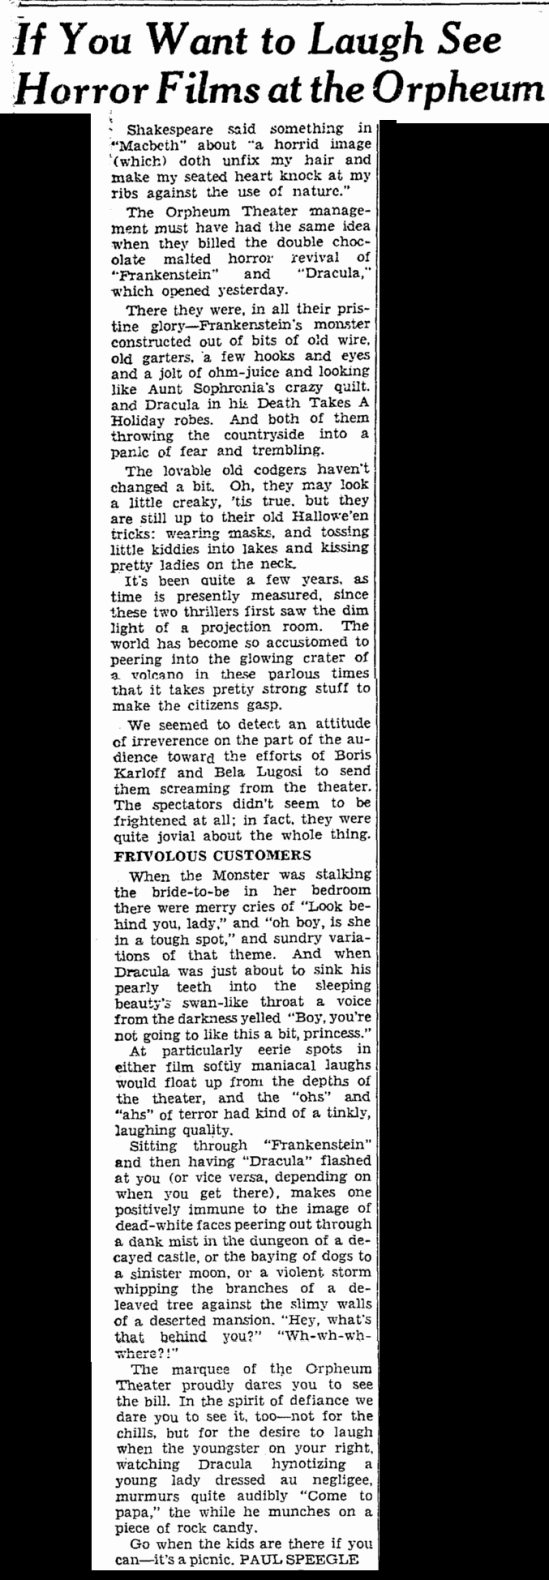 Dracula Frankenstein, San Francisco Chronicle, October 7, 1938